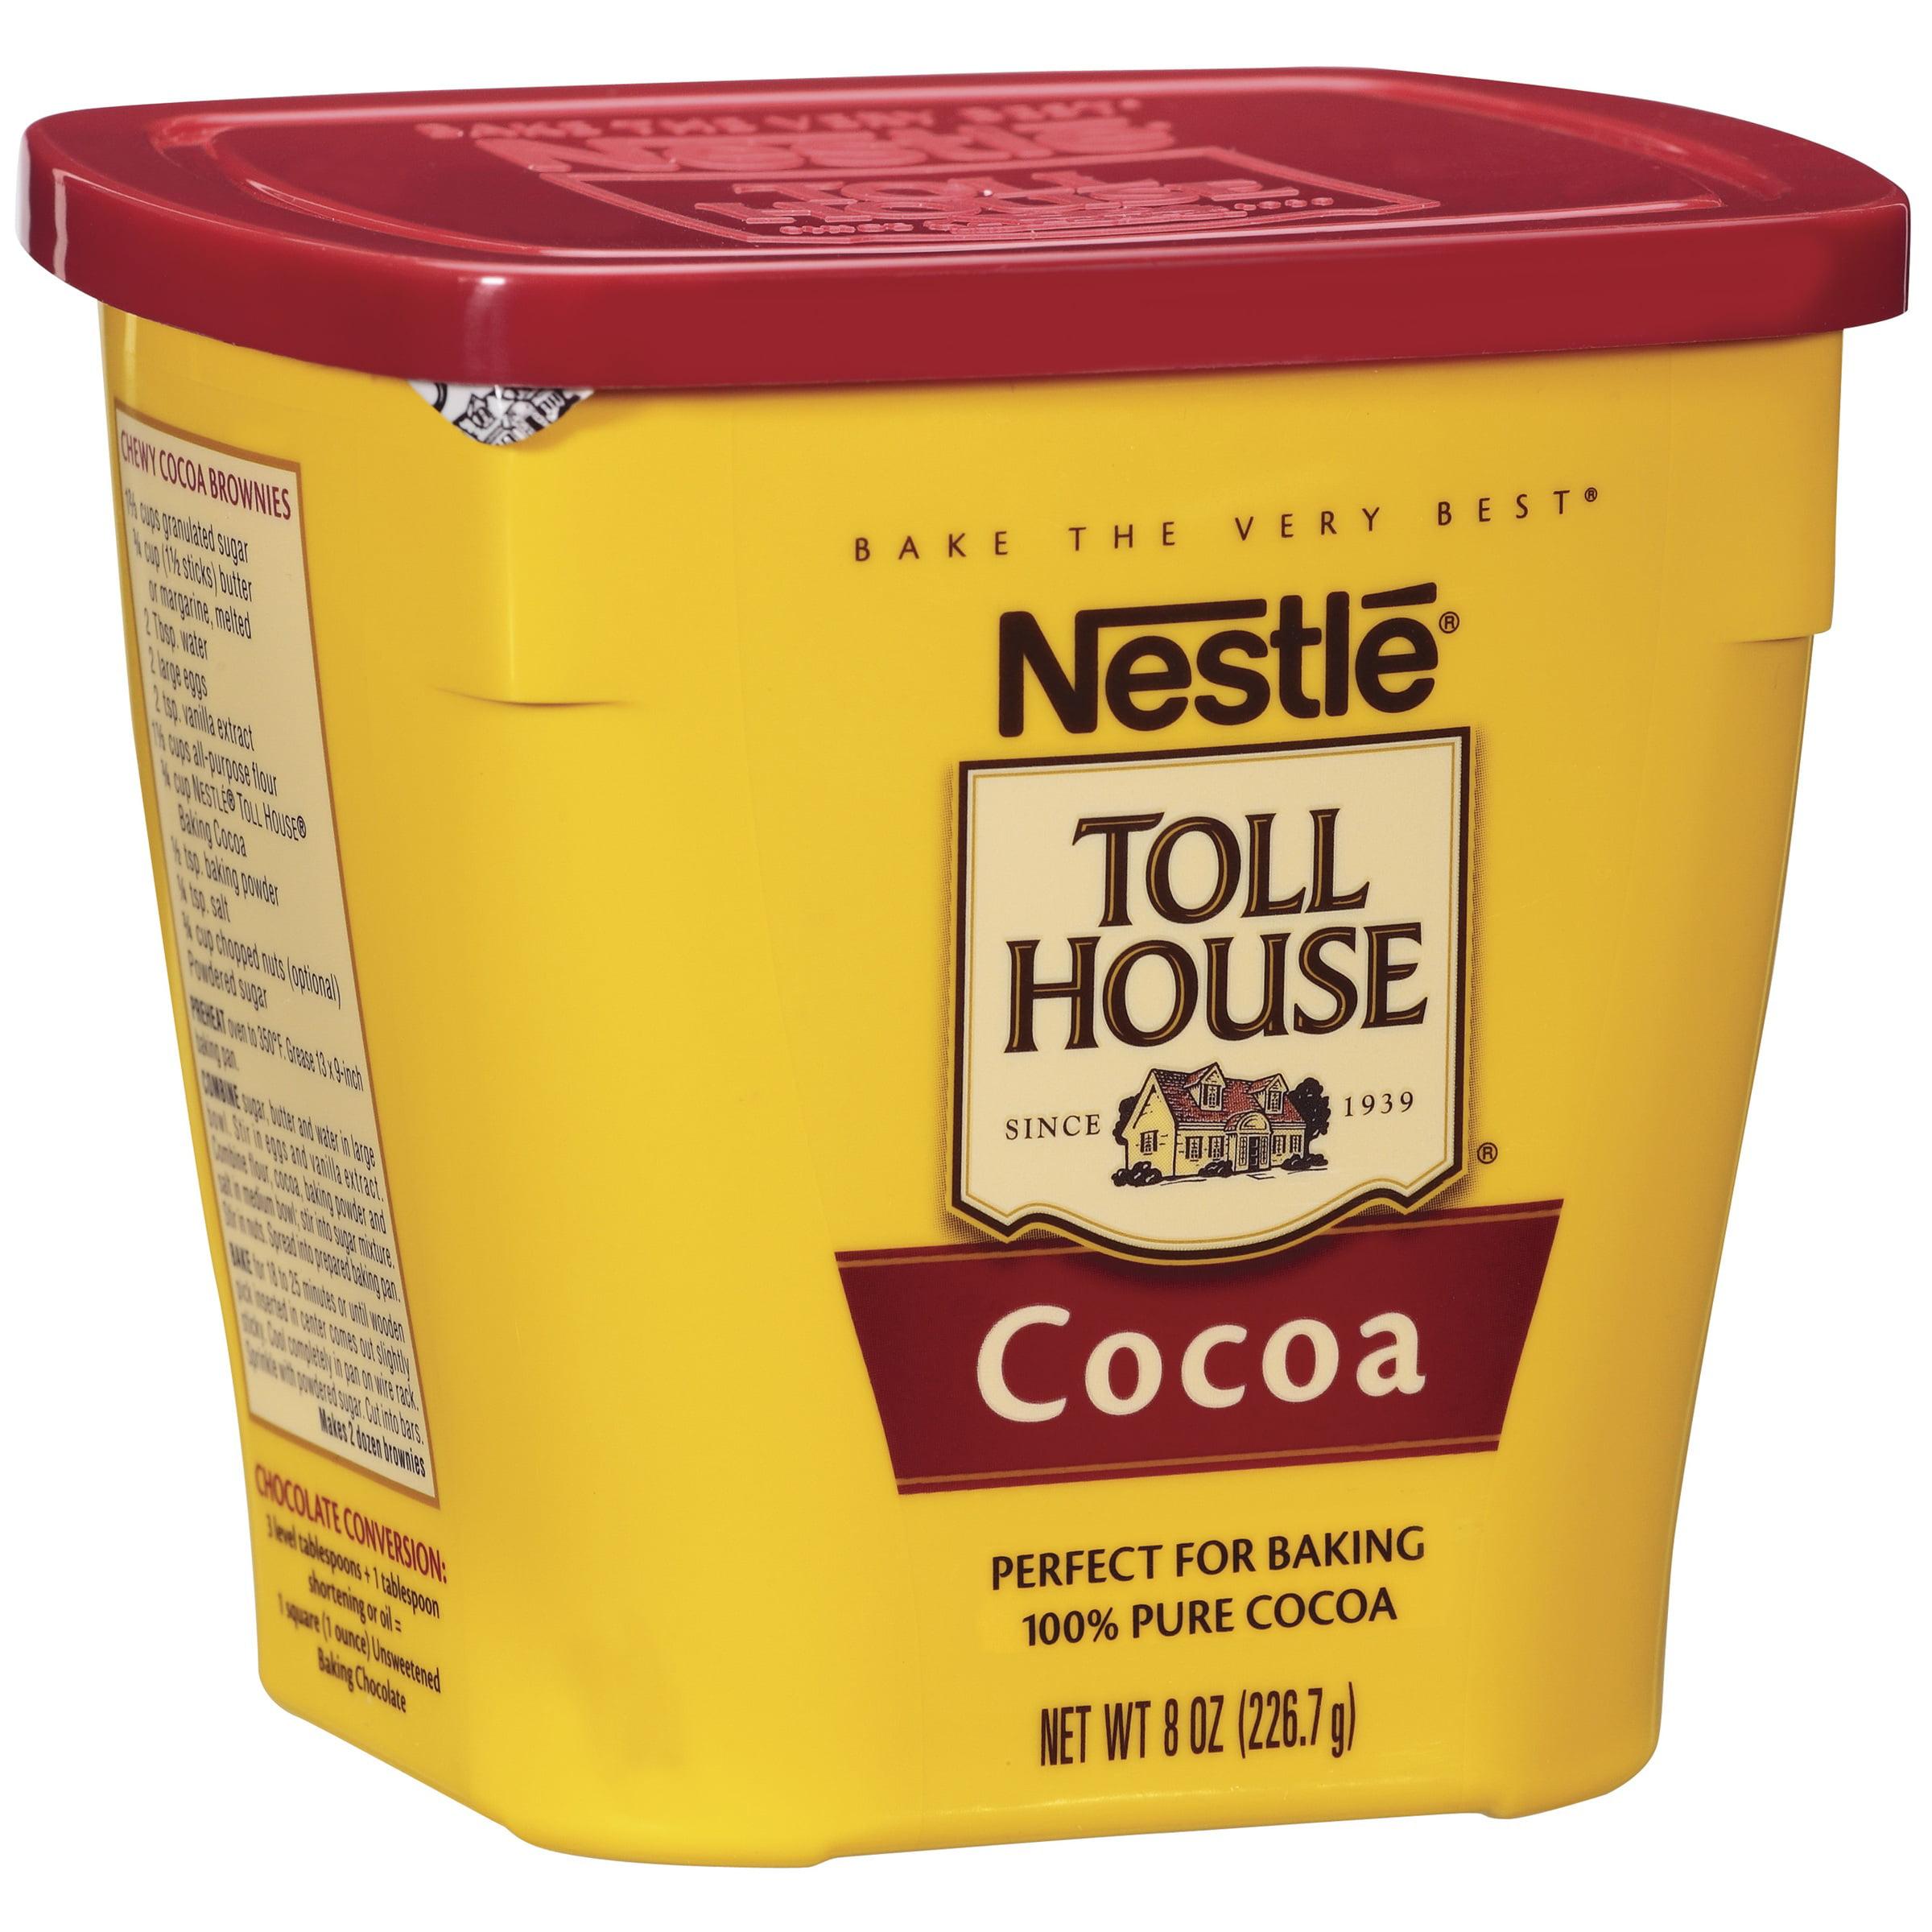 Nestle USA Inc. Nestl Baking, A Division Of Nestl Usa, Inc. Nestle Toll House Cocoa 8 Oz. Plastic Canister